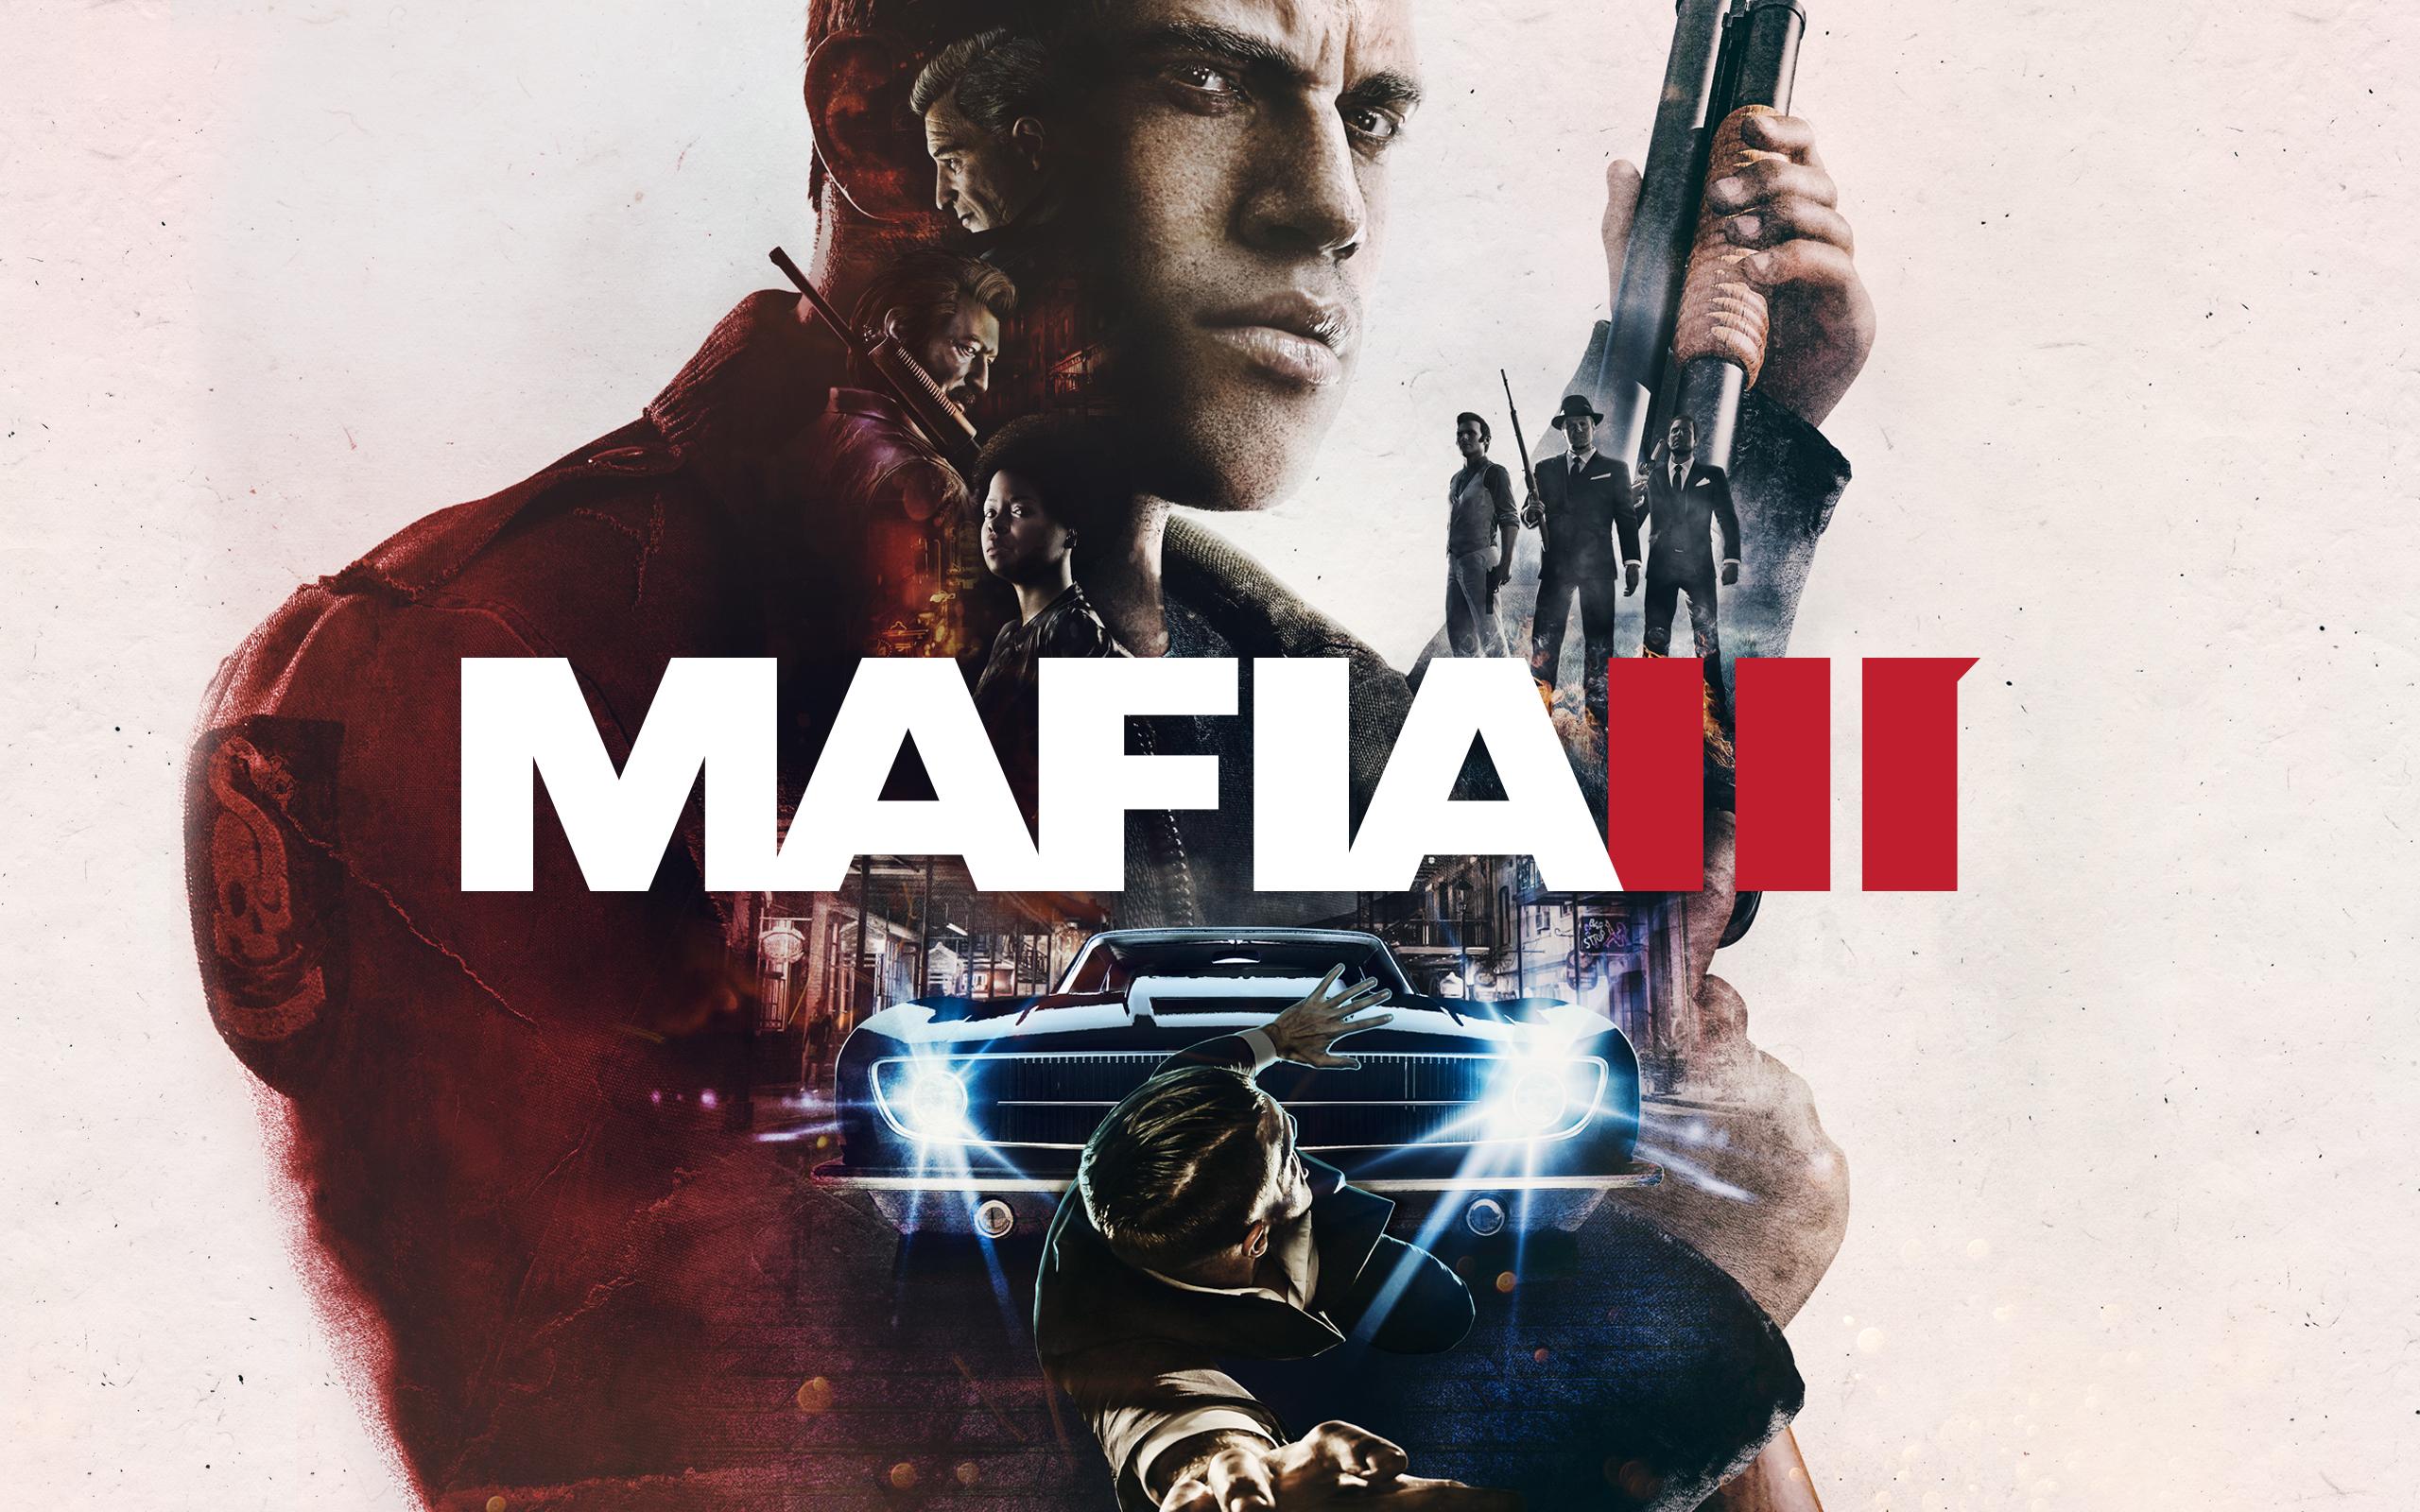 mafia 3 take place